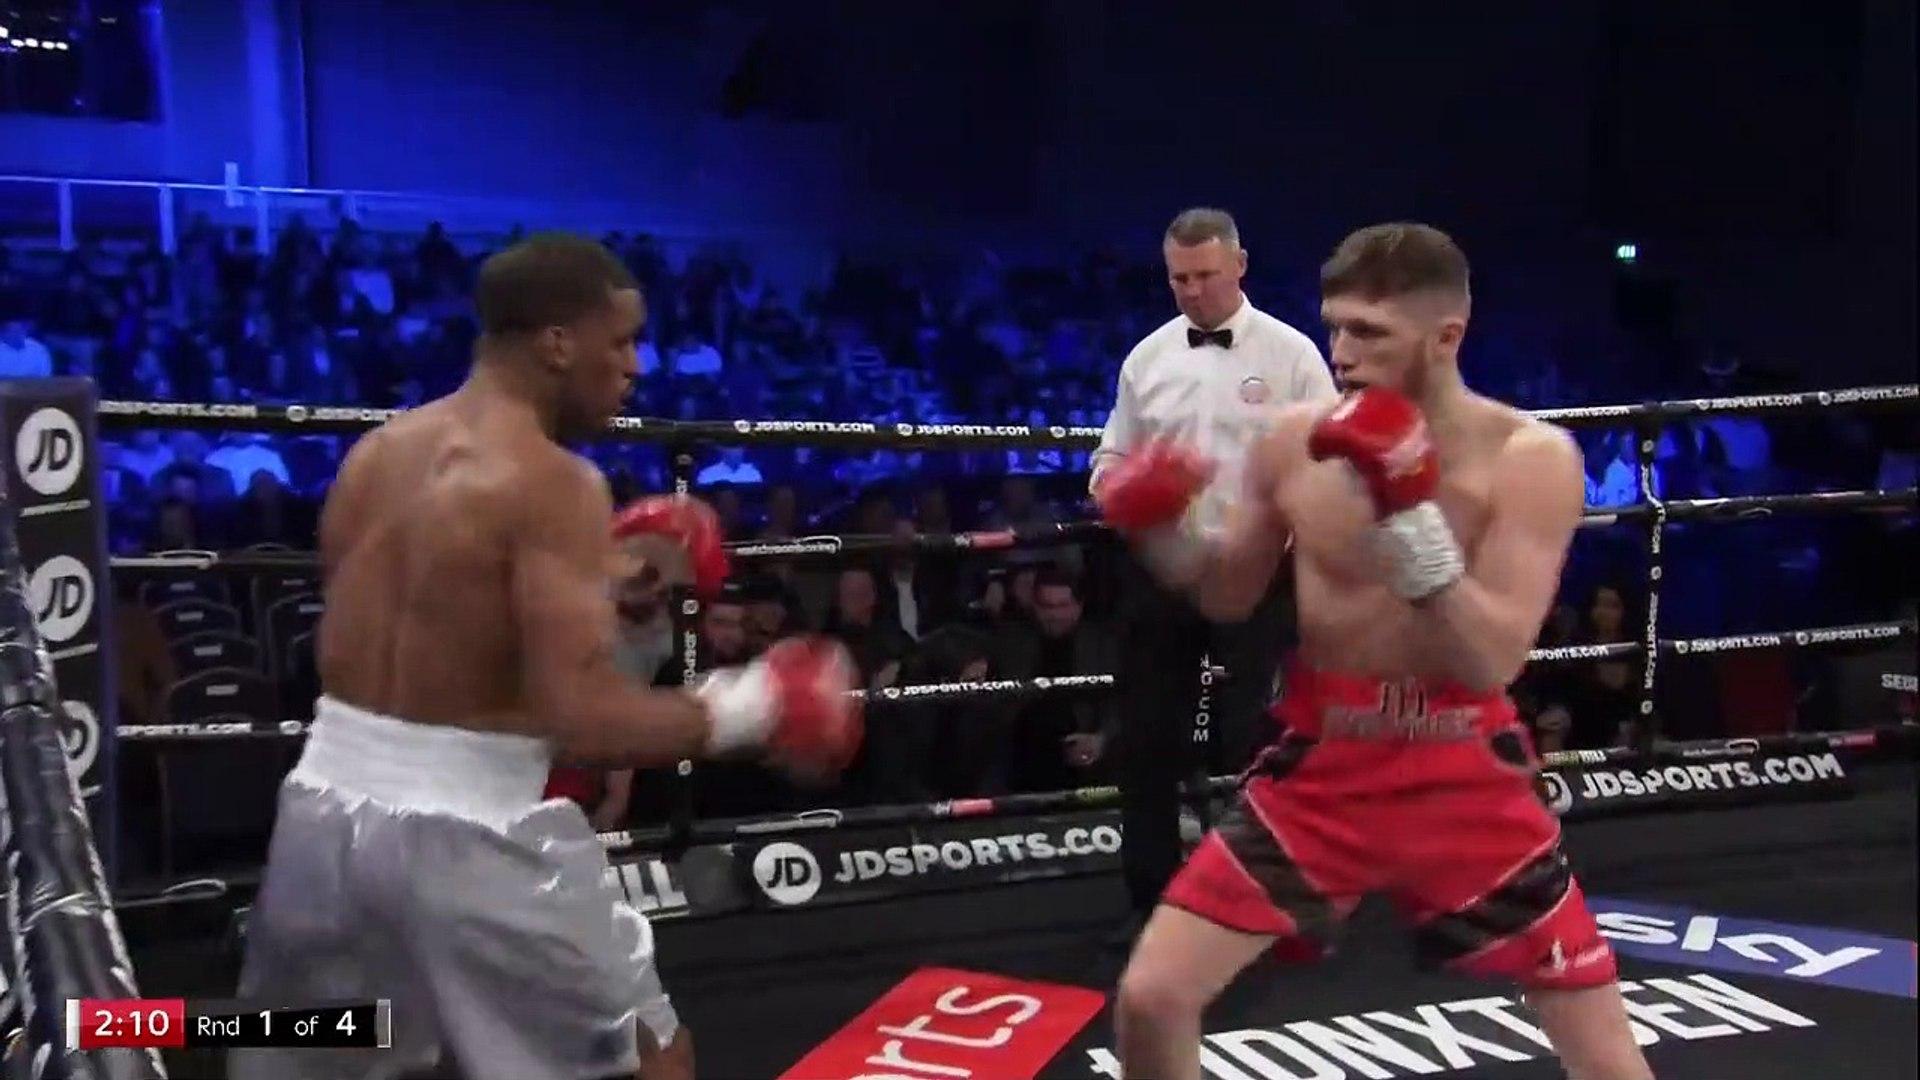 John Docherty vs Yailton Neves (02-03-2019) Full Fight 720 x 1280